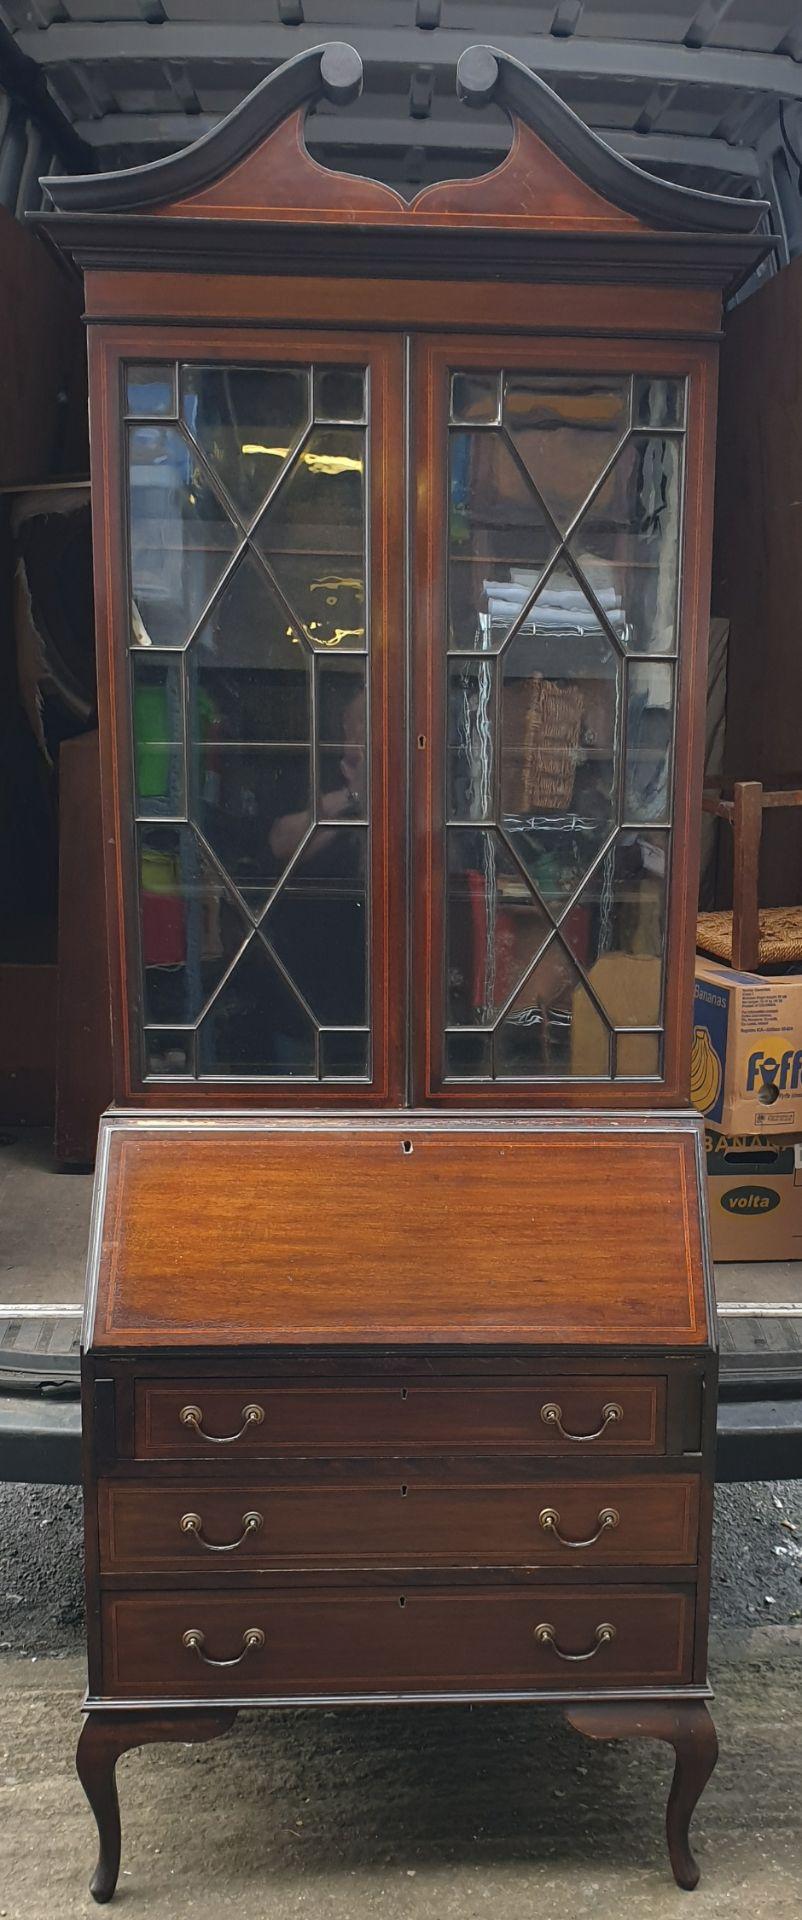 Antique Vintage Early 20th Century Georgian Style Glazed Bookcase Bureau with swan neck pediment